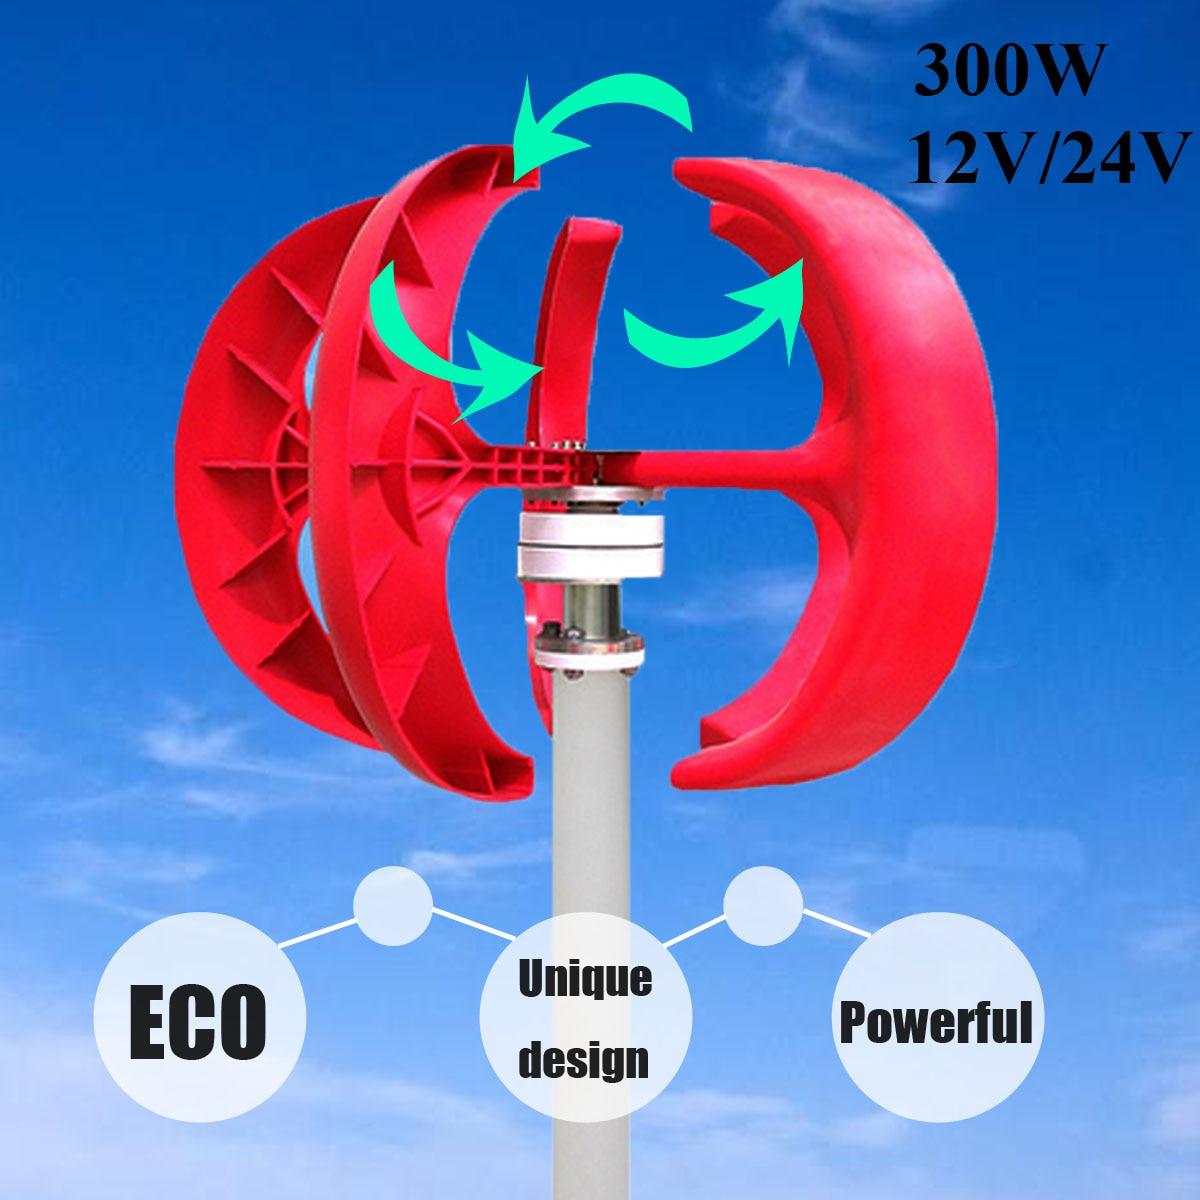 цена на 300W 12V/24V 5 Blades Wind Turbine Generator Power Vertical Axis Red Lantern Energy Fiber 3 Phase AC Permanent Magnet Generator